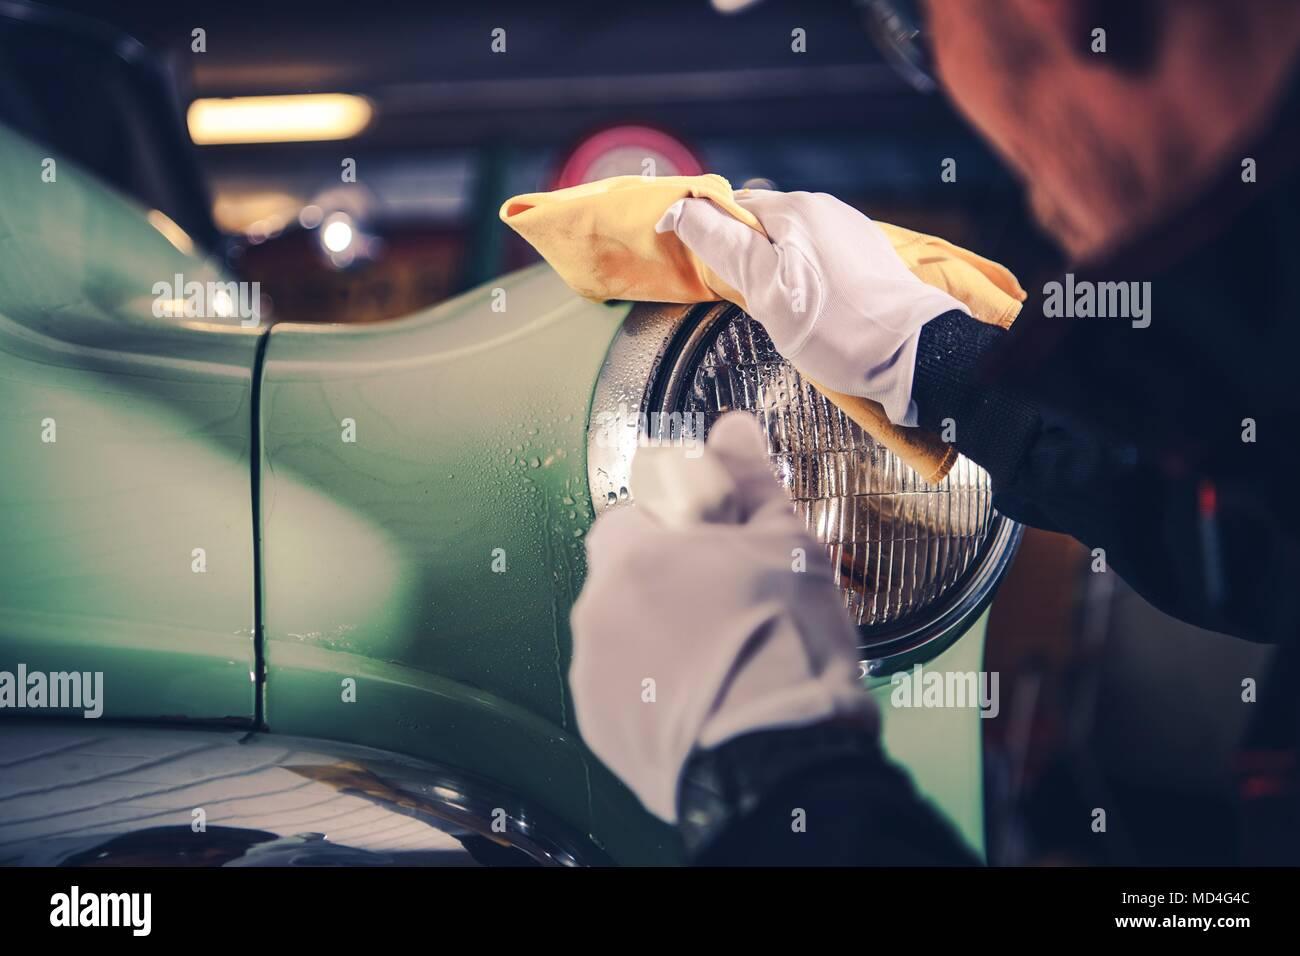 Retro coche detallando. Limpieza de coches clásicos por vehículo profesional limpiador. Imagen De Stock